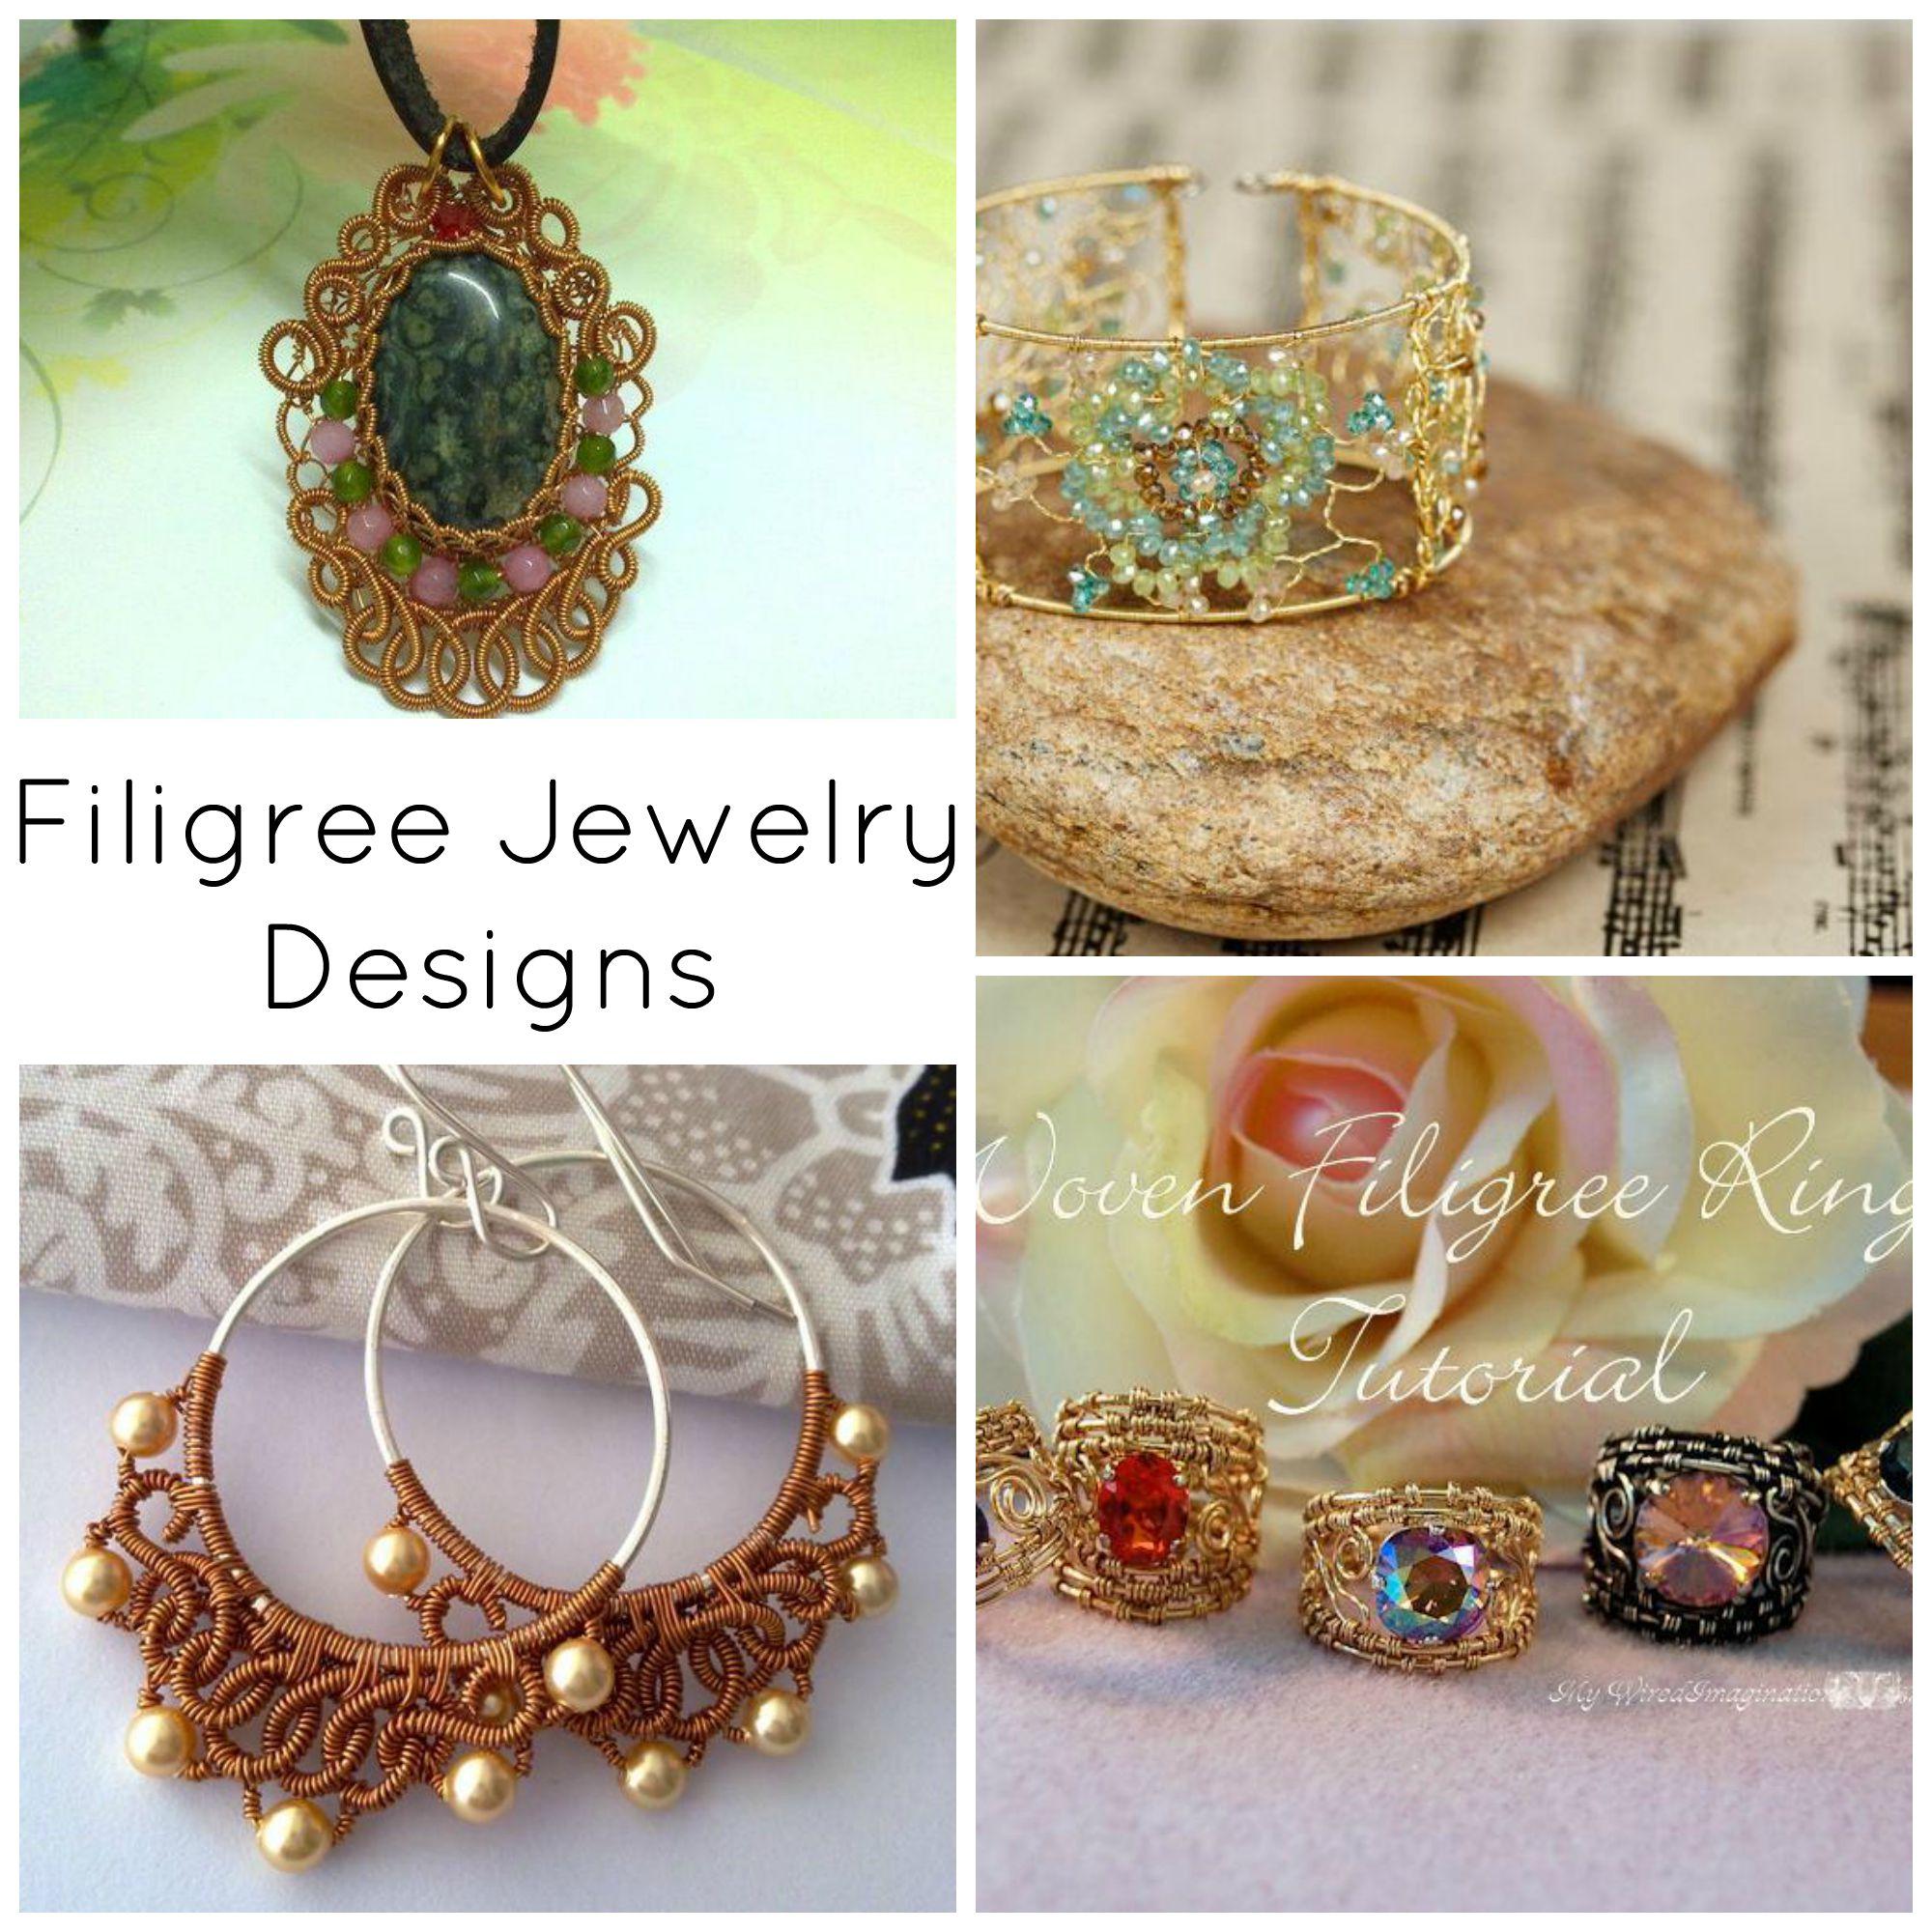 Filigree Jewelry Designs